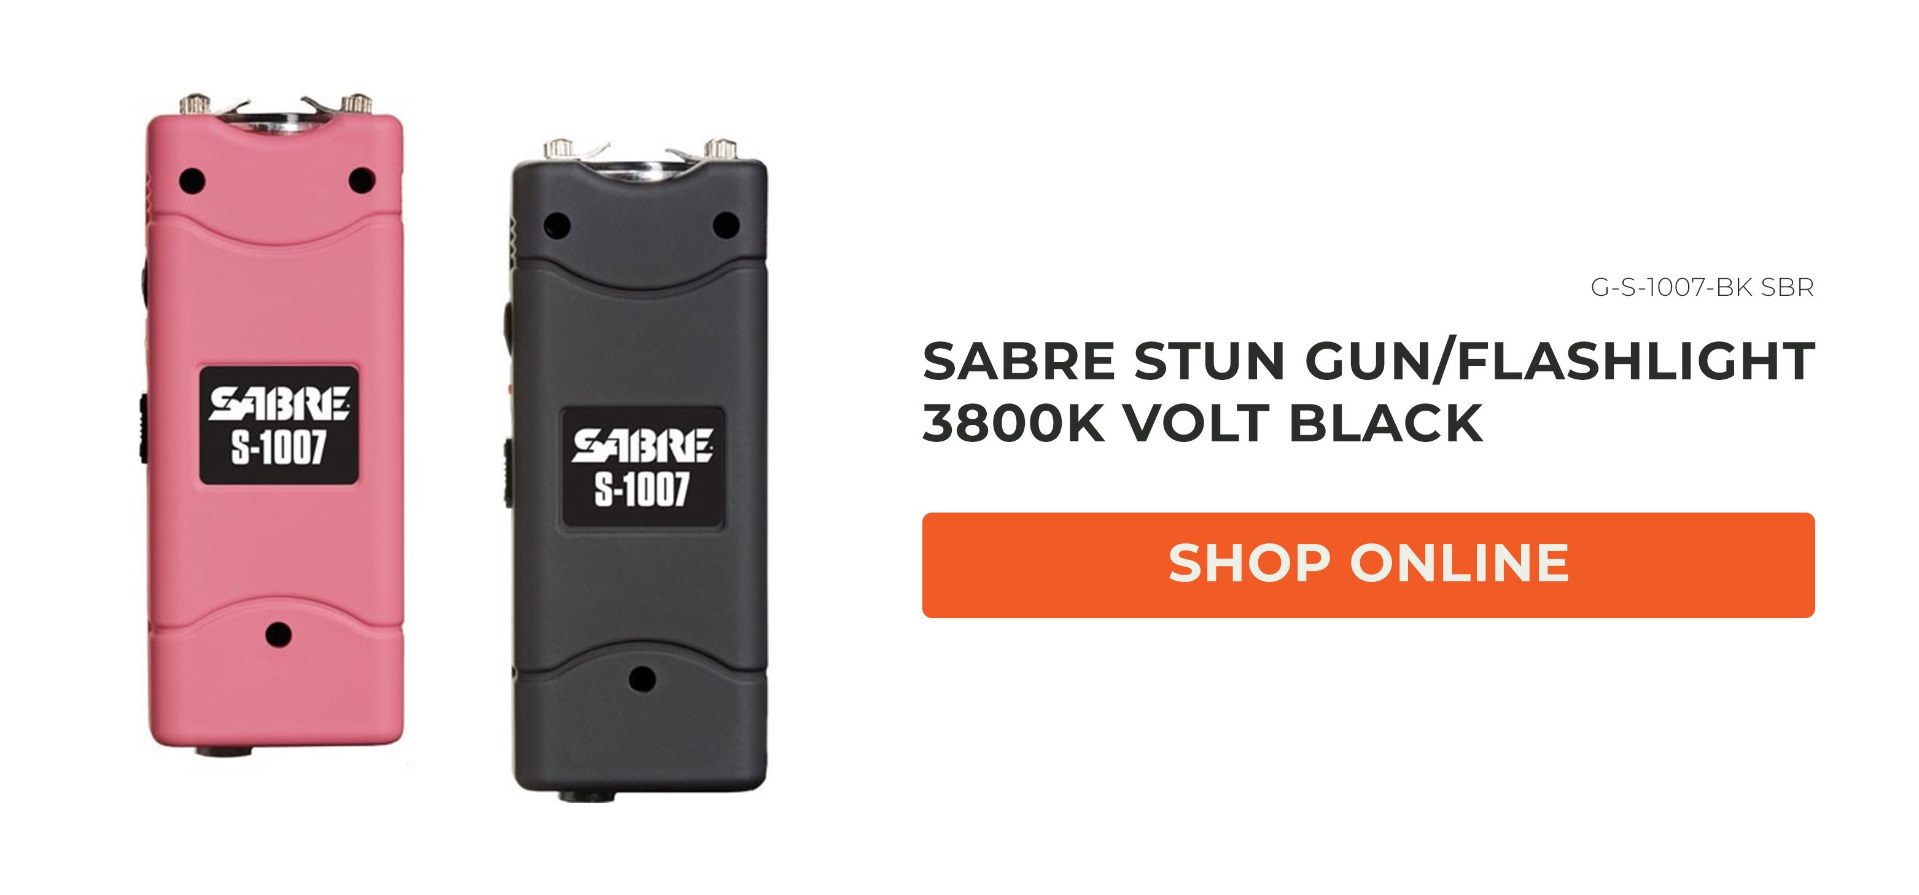 SABRE STUN GUN/FLASHLIGHT 3800K VOLT BLACK